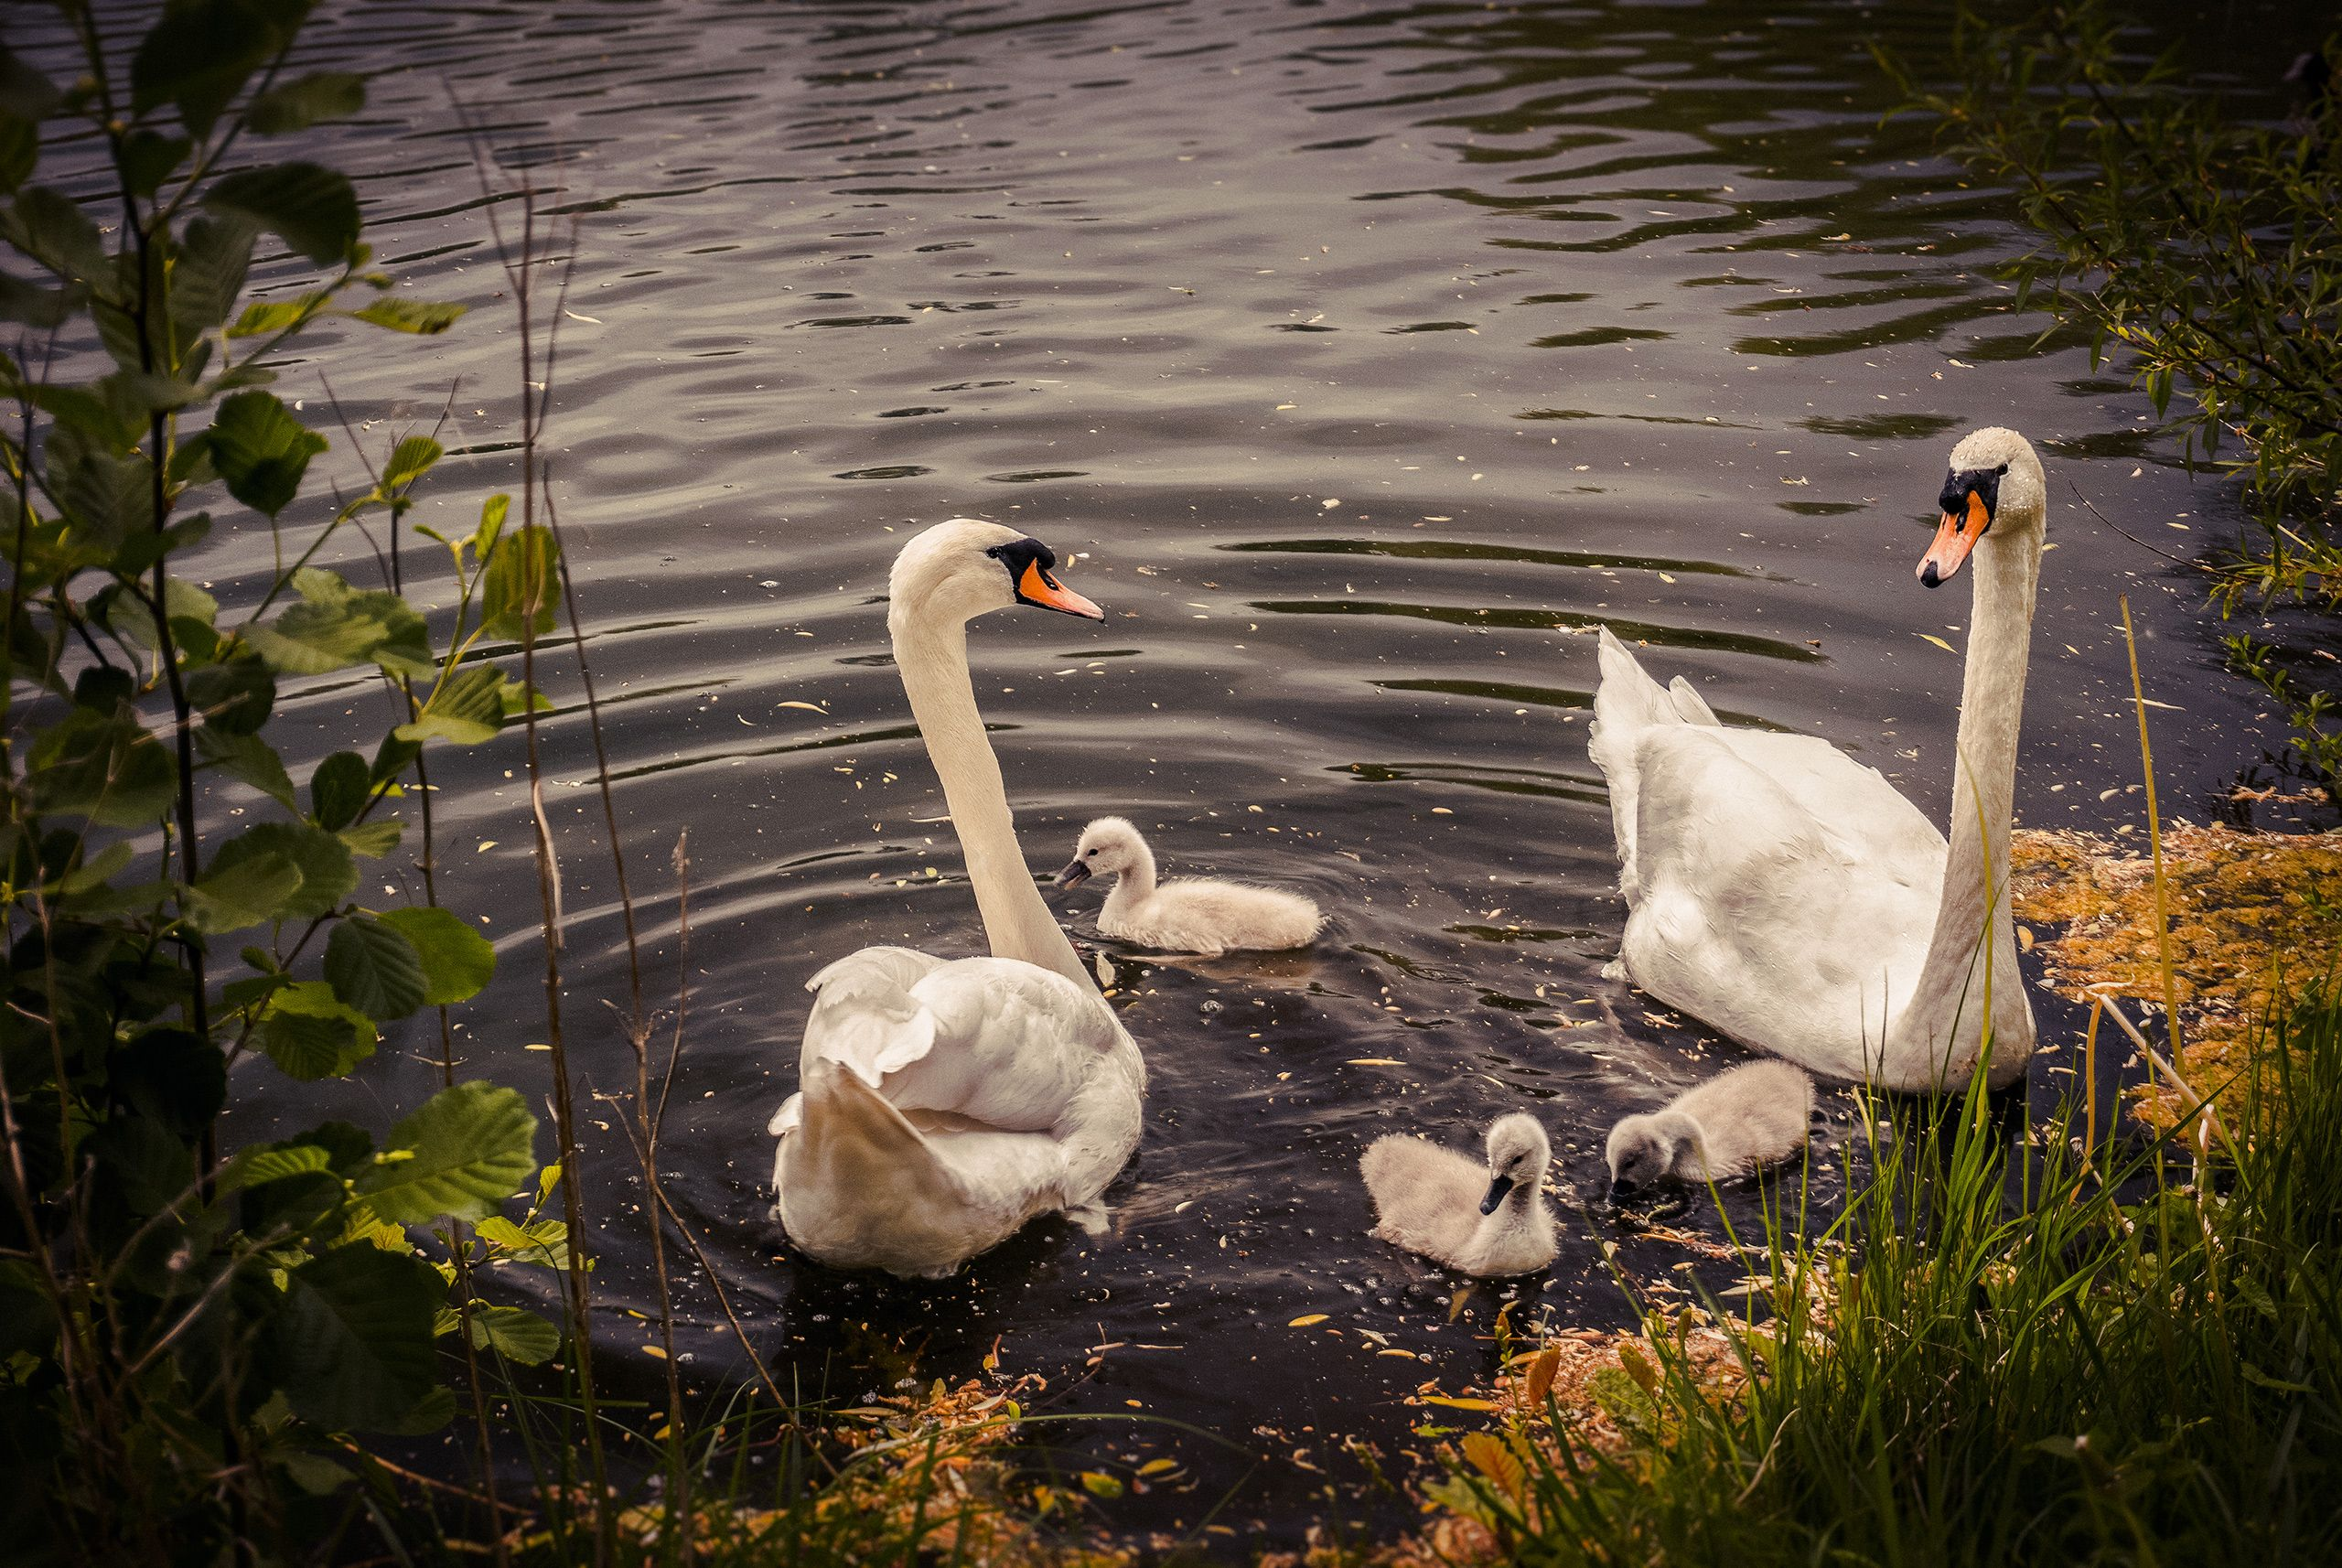 #lake #see #swan #swans #schwan #schwaene #schwanenfamilie #schwanenbaby #swanbaby #swanfamiliy #swanbabies #schwanenbabys